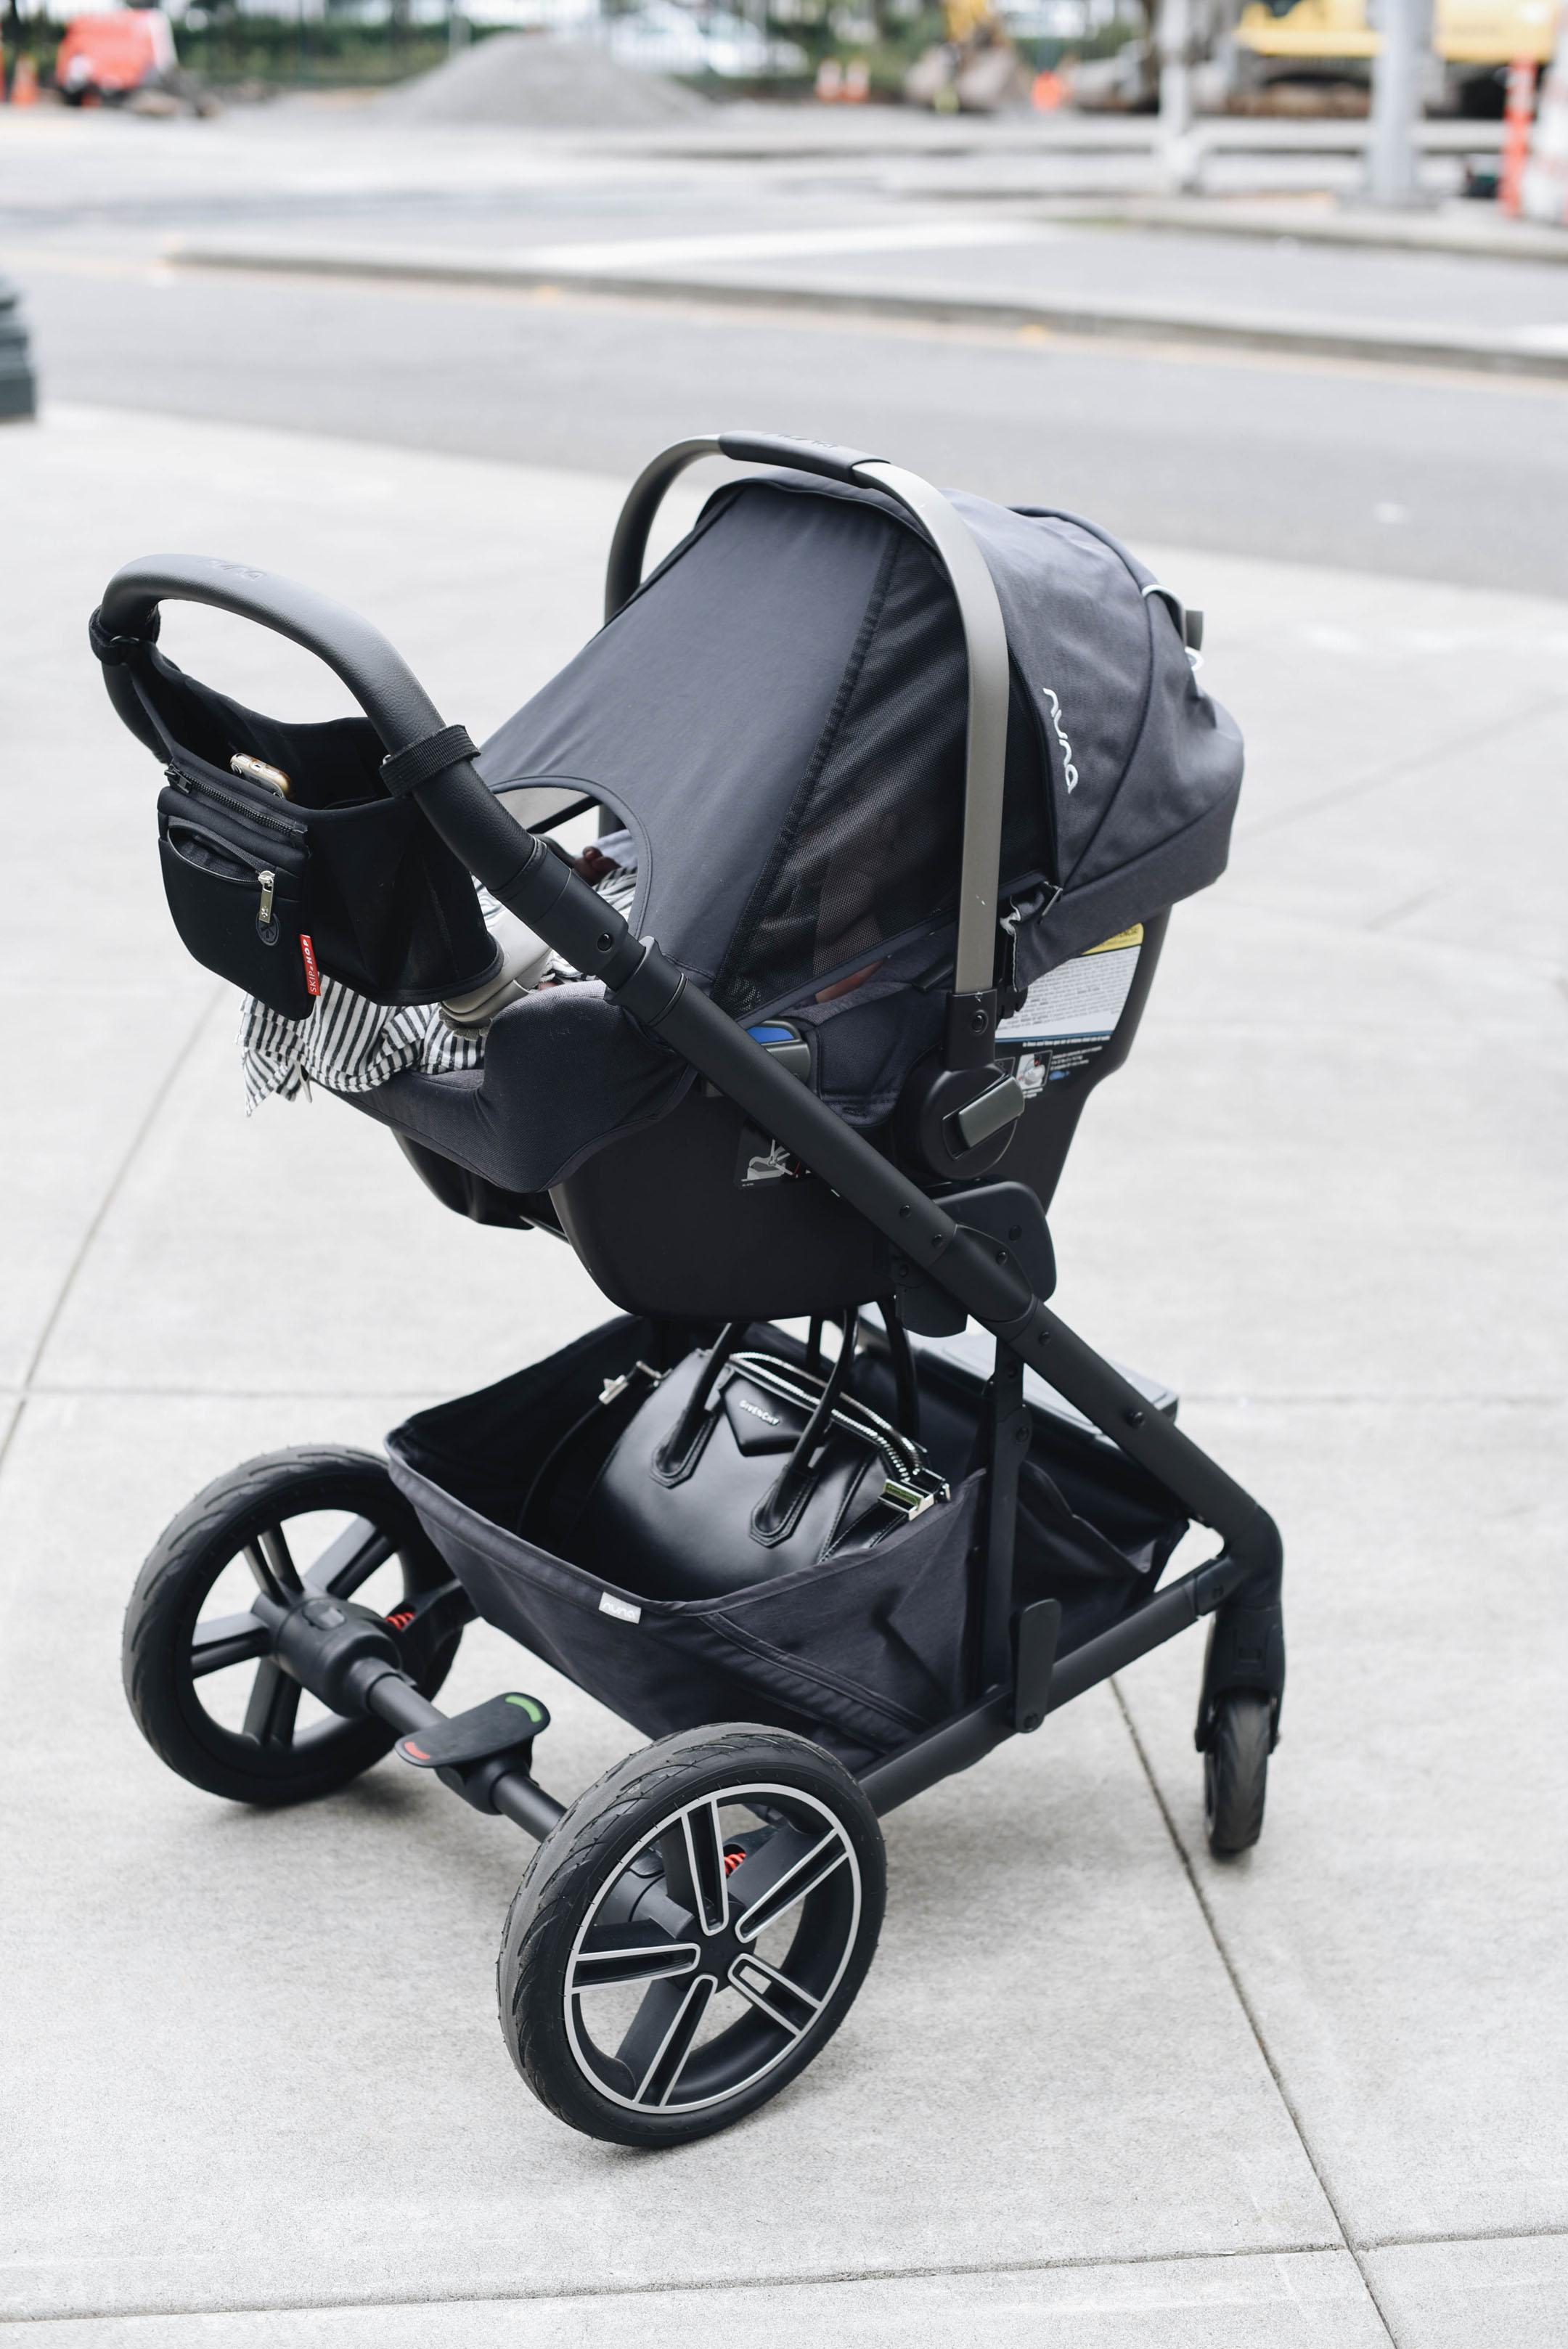 Nuna Mixx Stroller System Pipa Car Seat Set Review Crystalin Marie